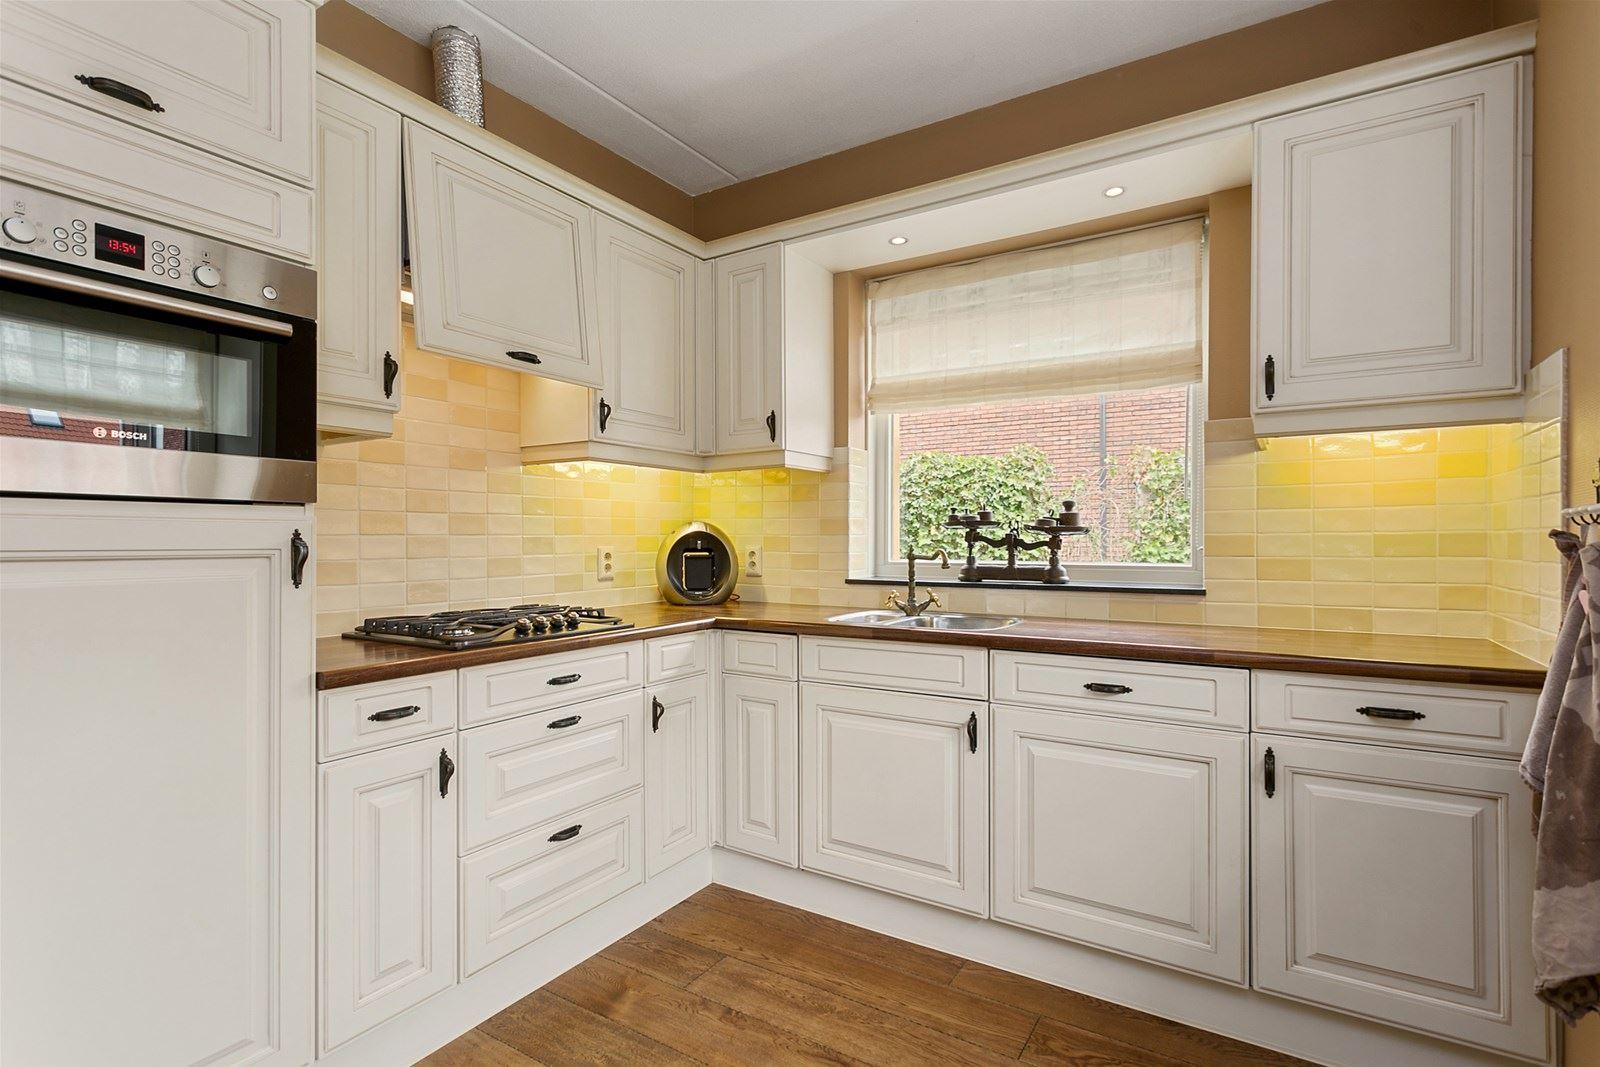 landelijke brocante keuken : Brocante Landelijke L Keuken Incl Apparatuur 2 35 X2 63 Mtr